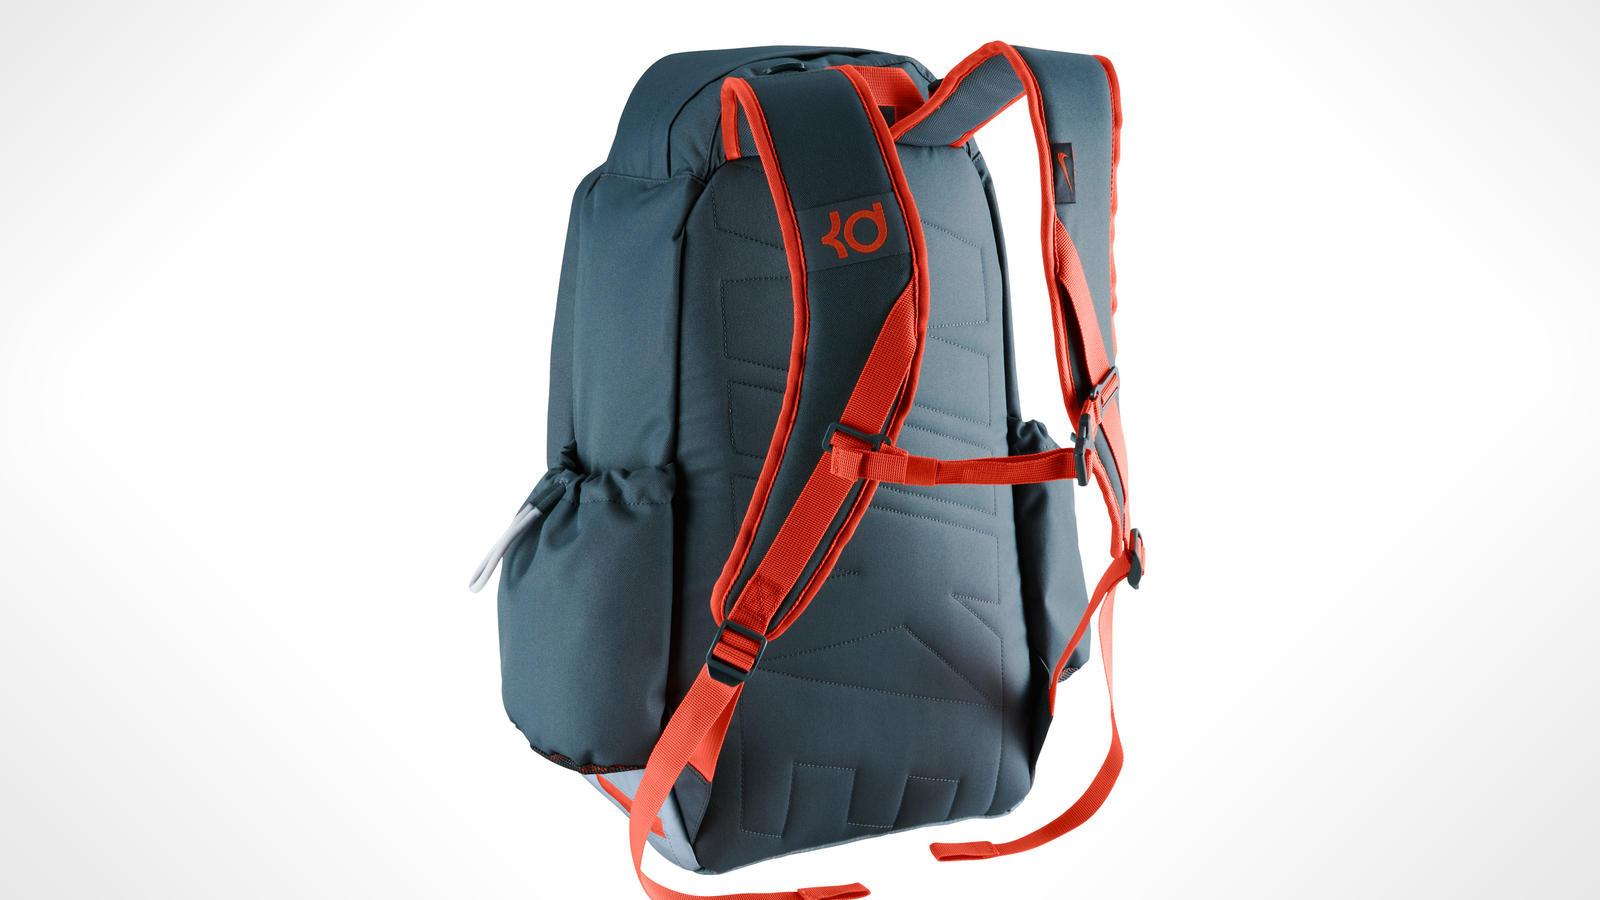 kd-backpack-2